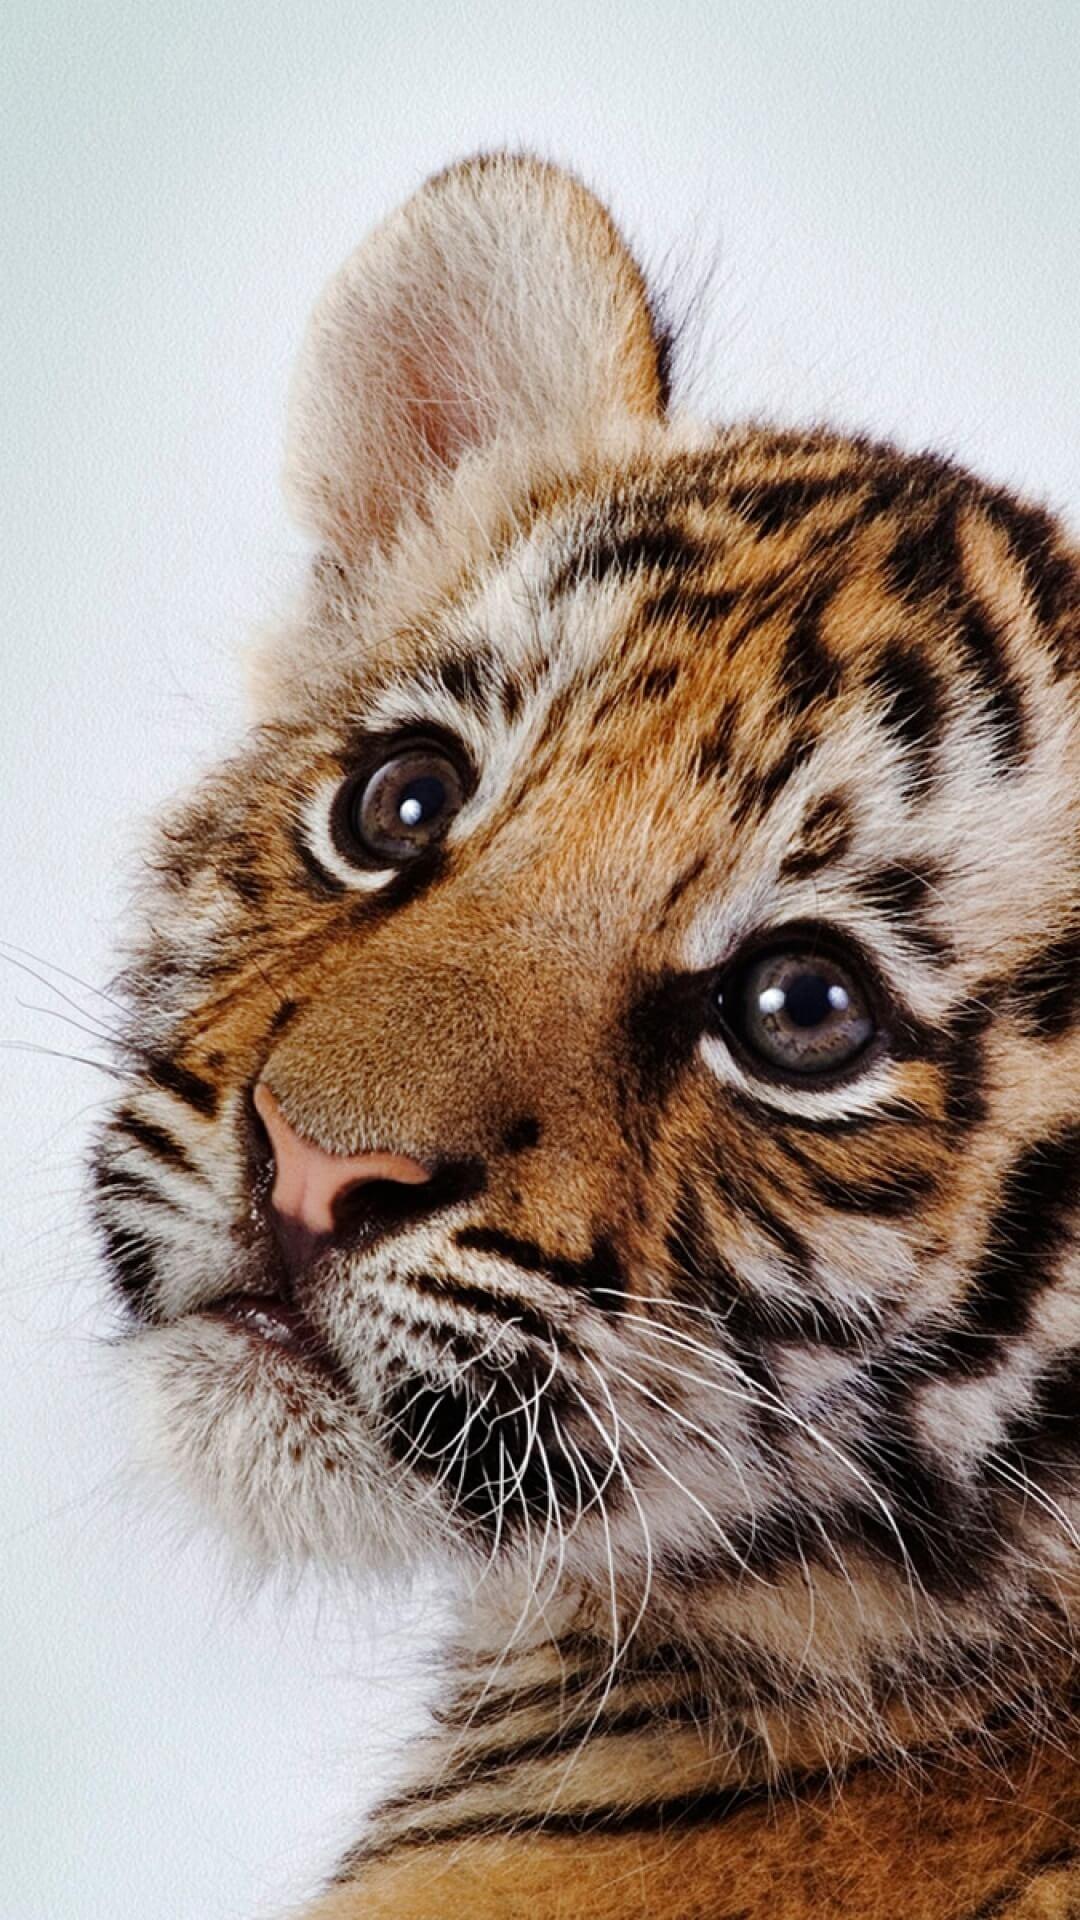 48+ Tiger iPhone Wallpaper Supreme on WallpaperSafari